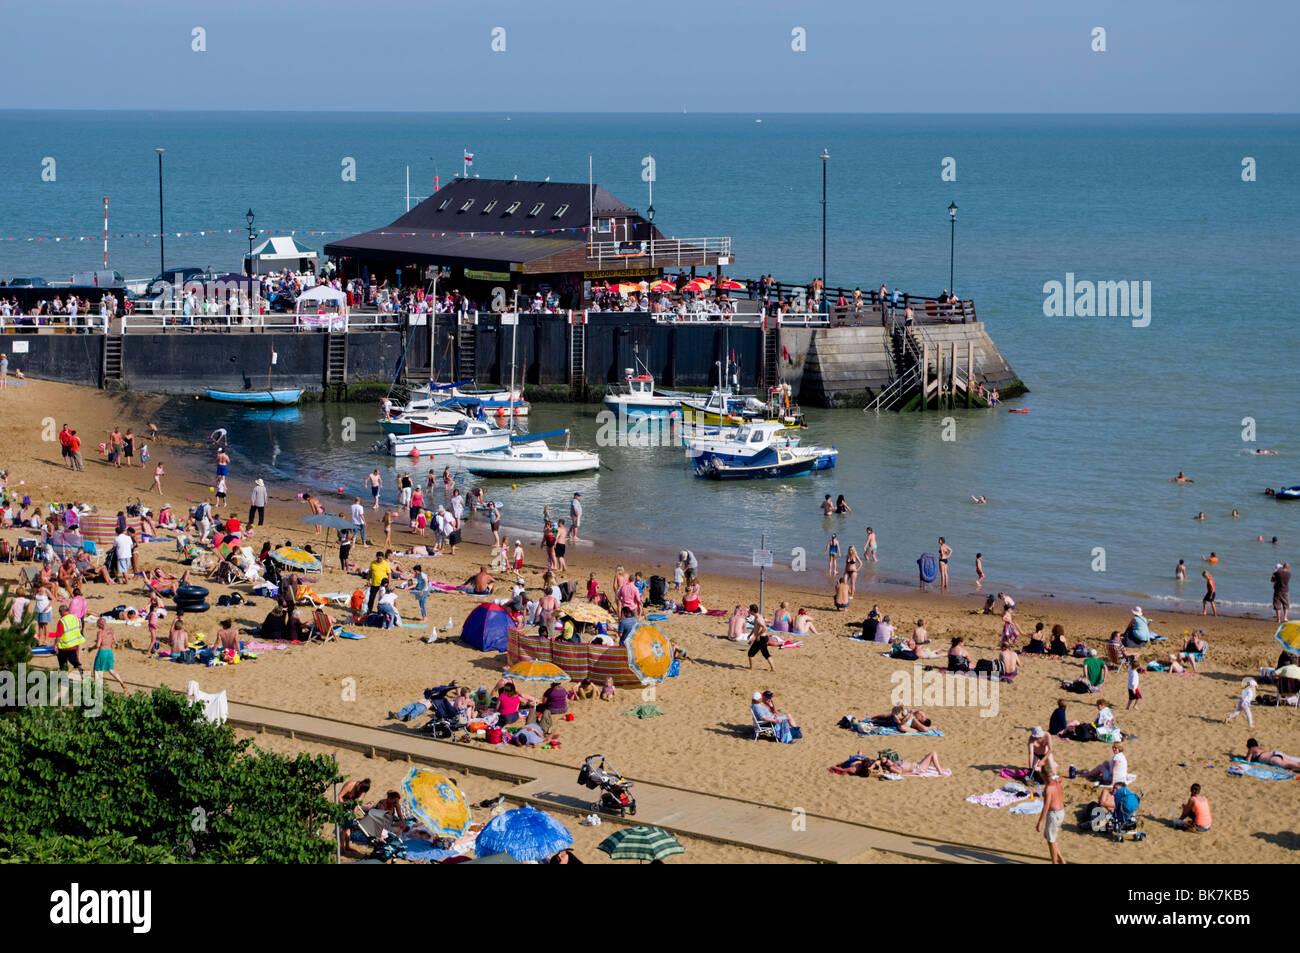 Viking Bay beach, Broadstairs, Kent, England, United Kingdom, Europe - Stock Image